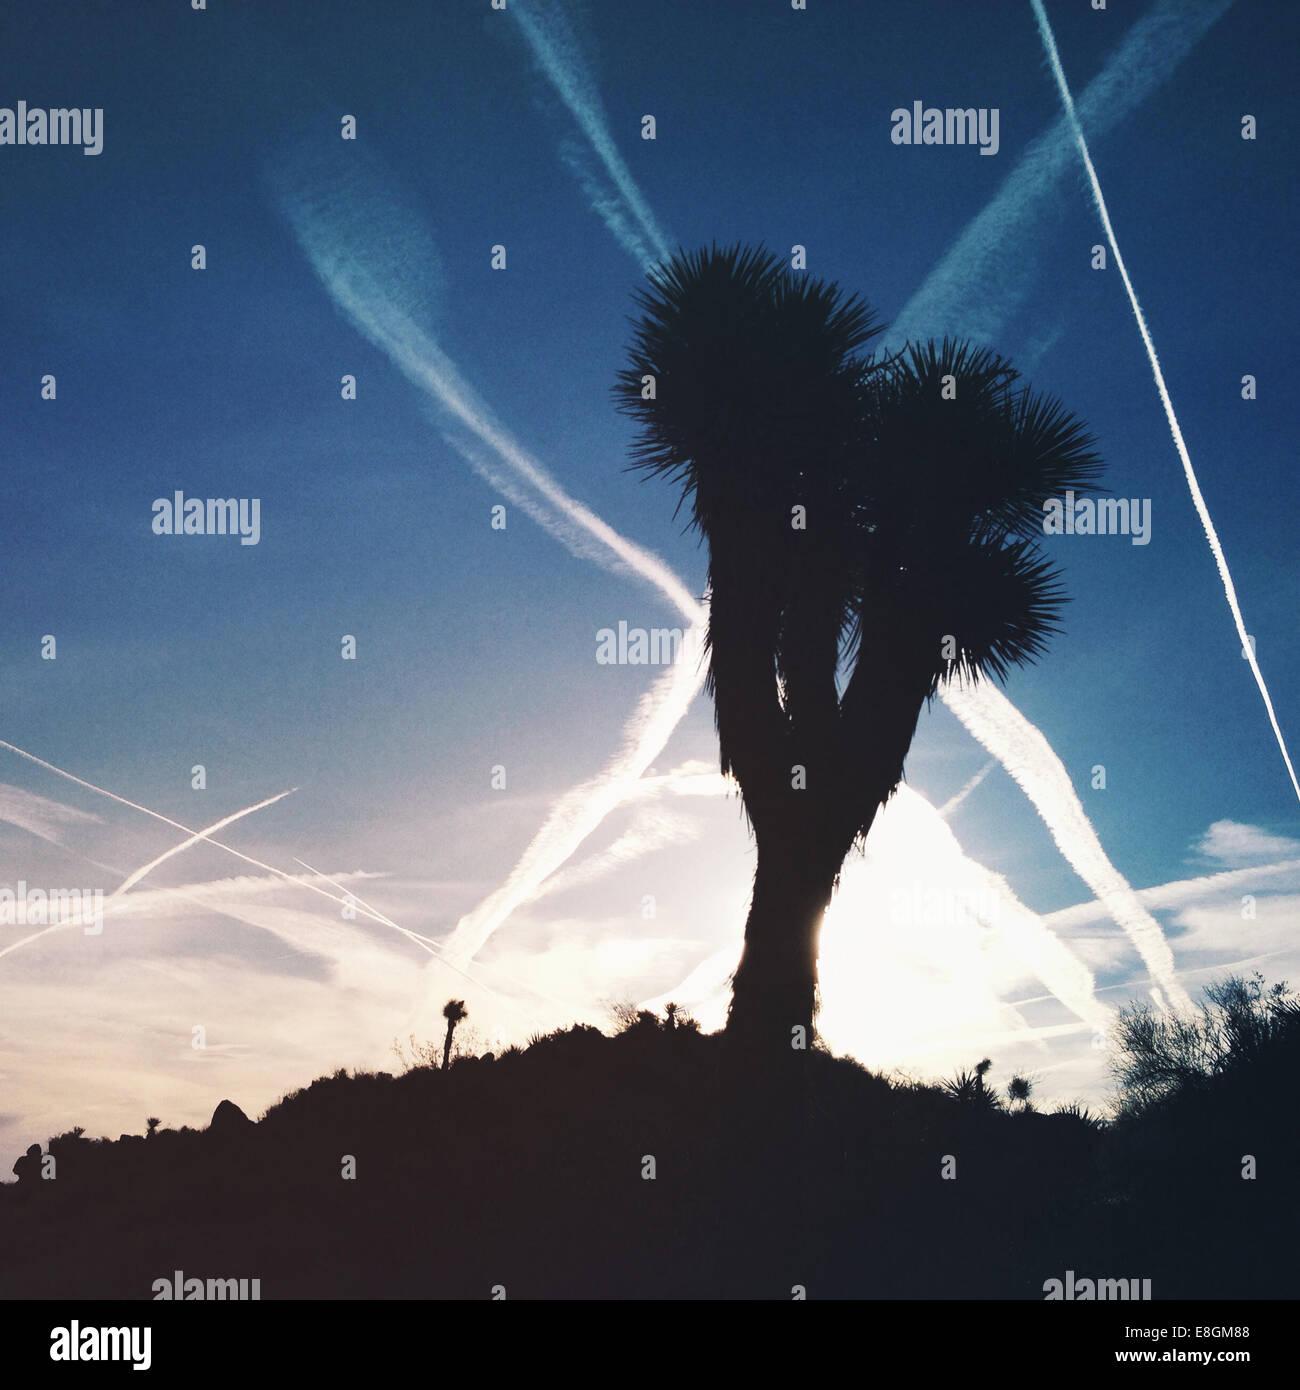 Silhouette of Joshua Tree, Joshua Tree National Park, California, United States Stock Photo